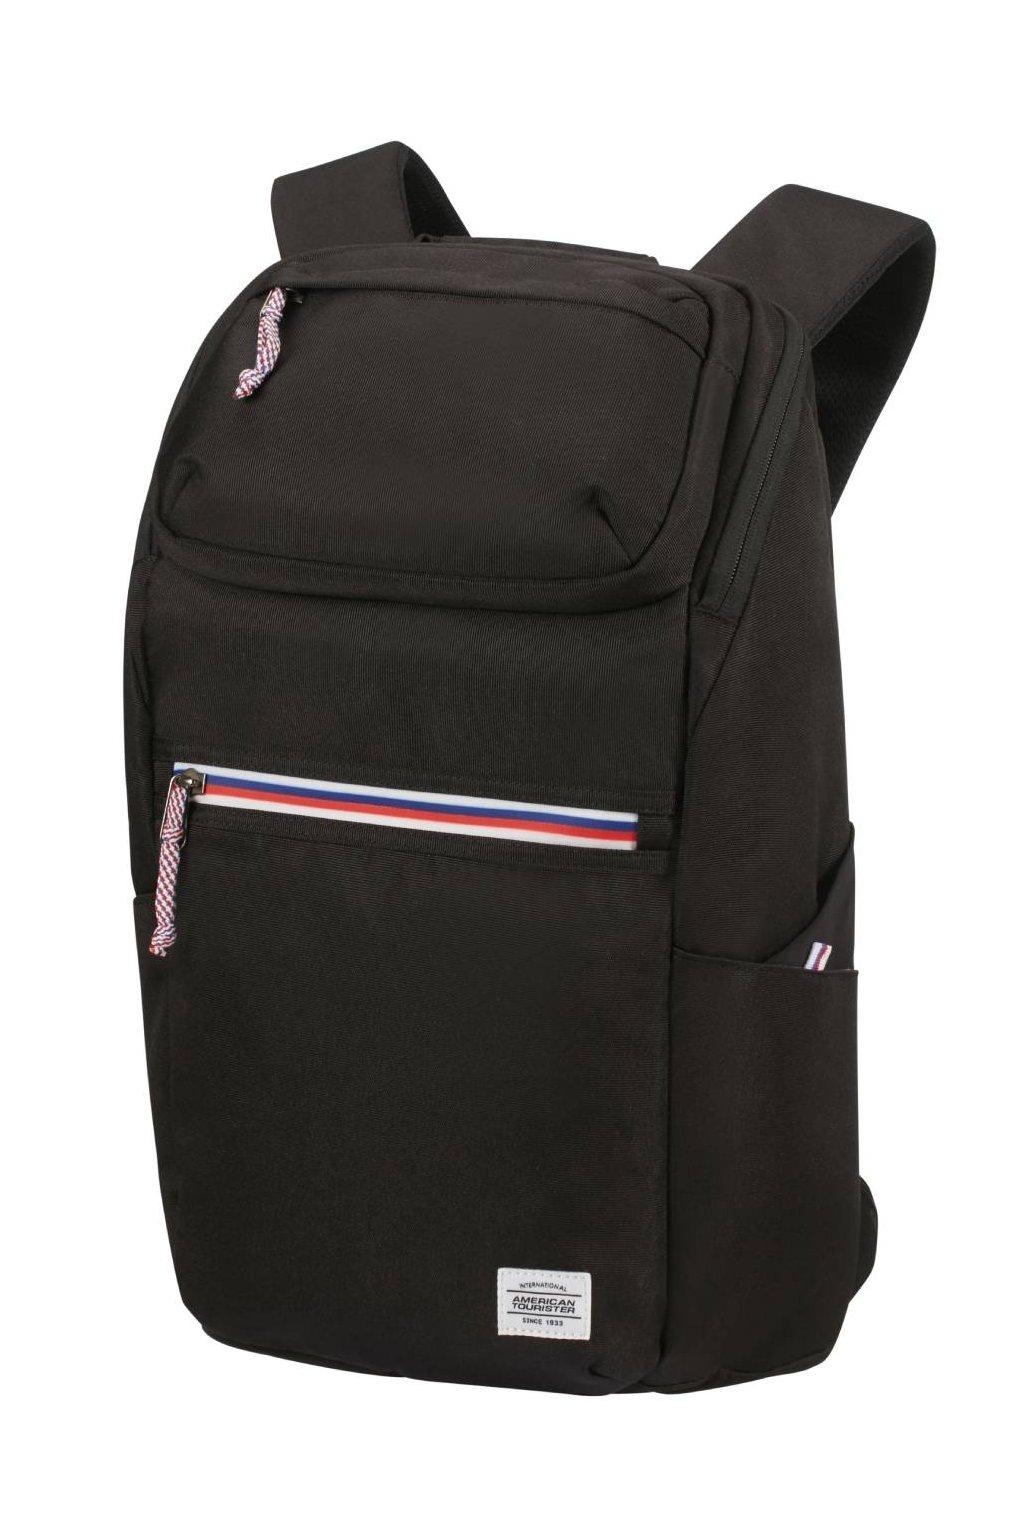 kufrland americantourister upbeat laptopbackpack15.65